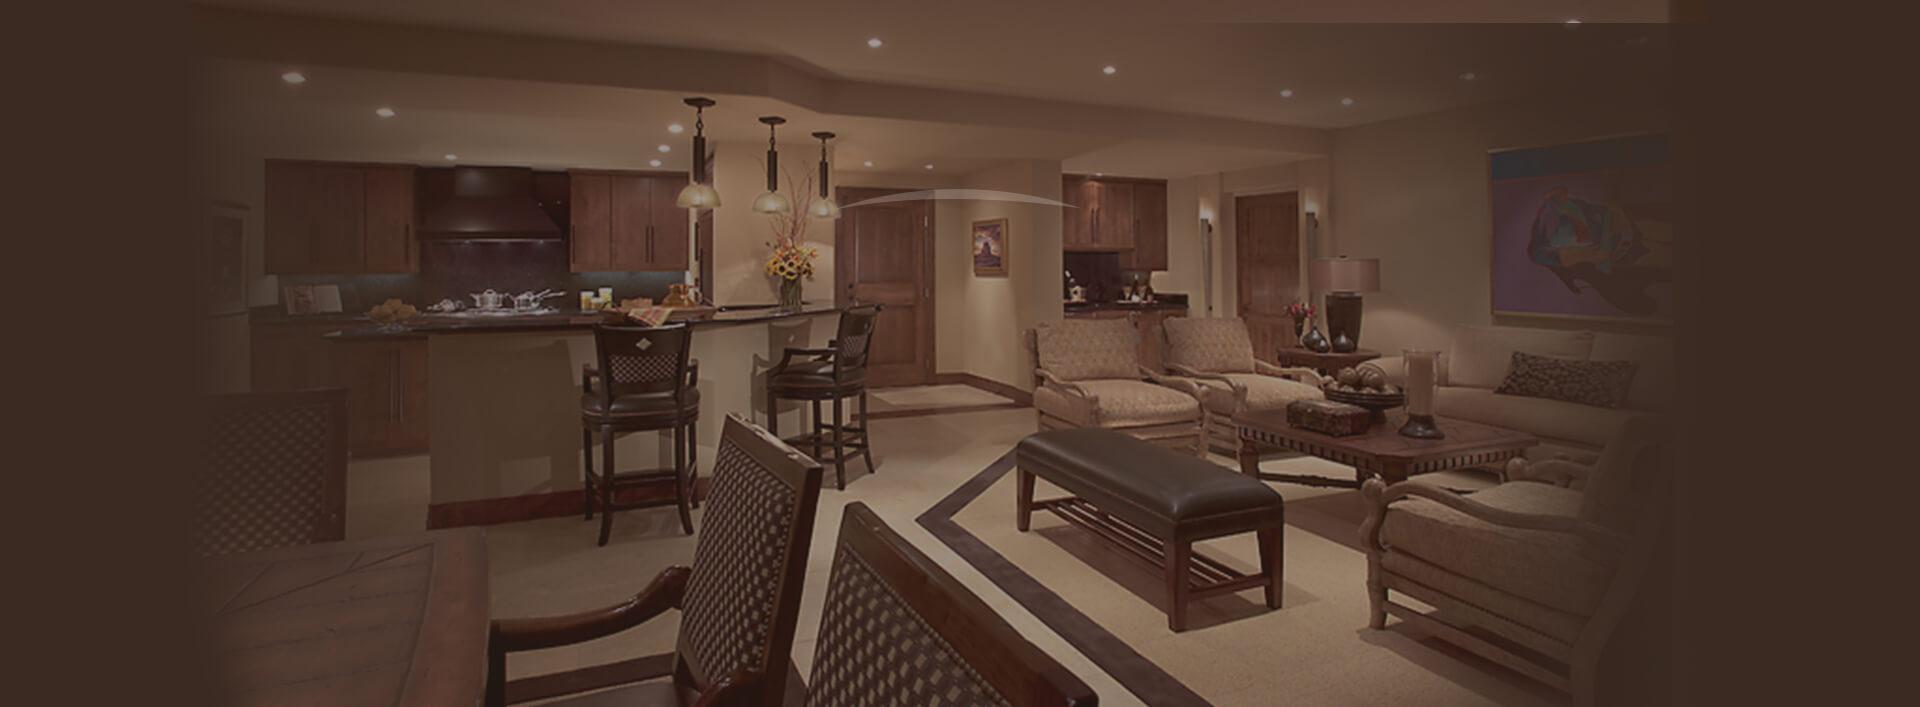 The Landmark Luxury Conference Room